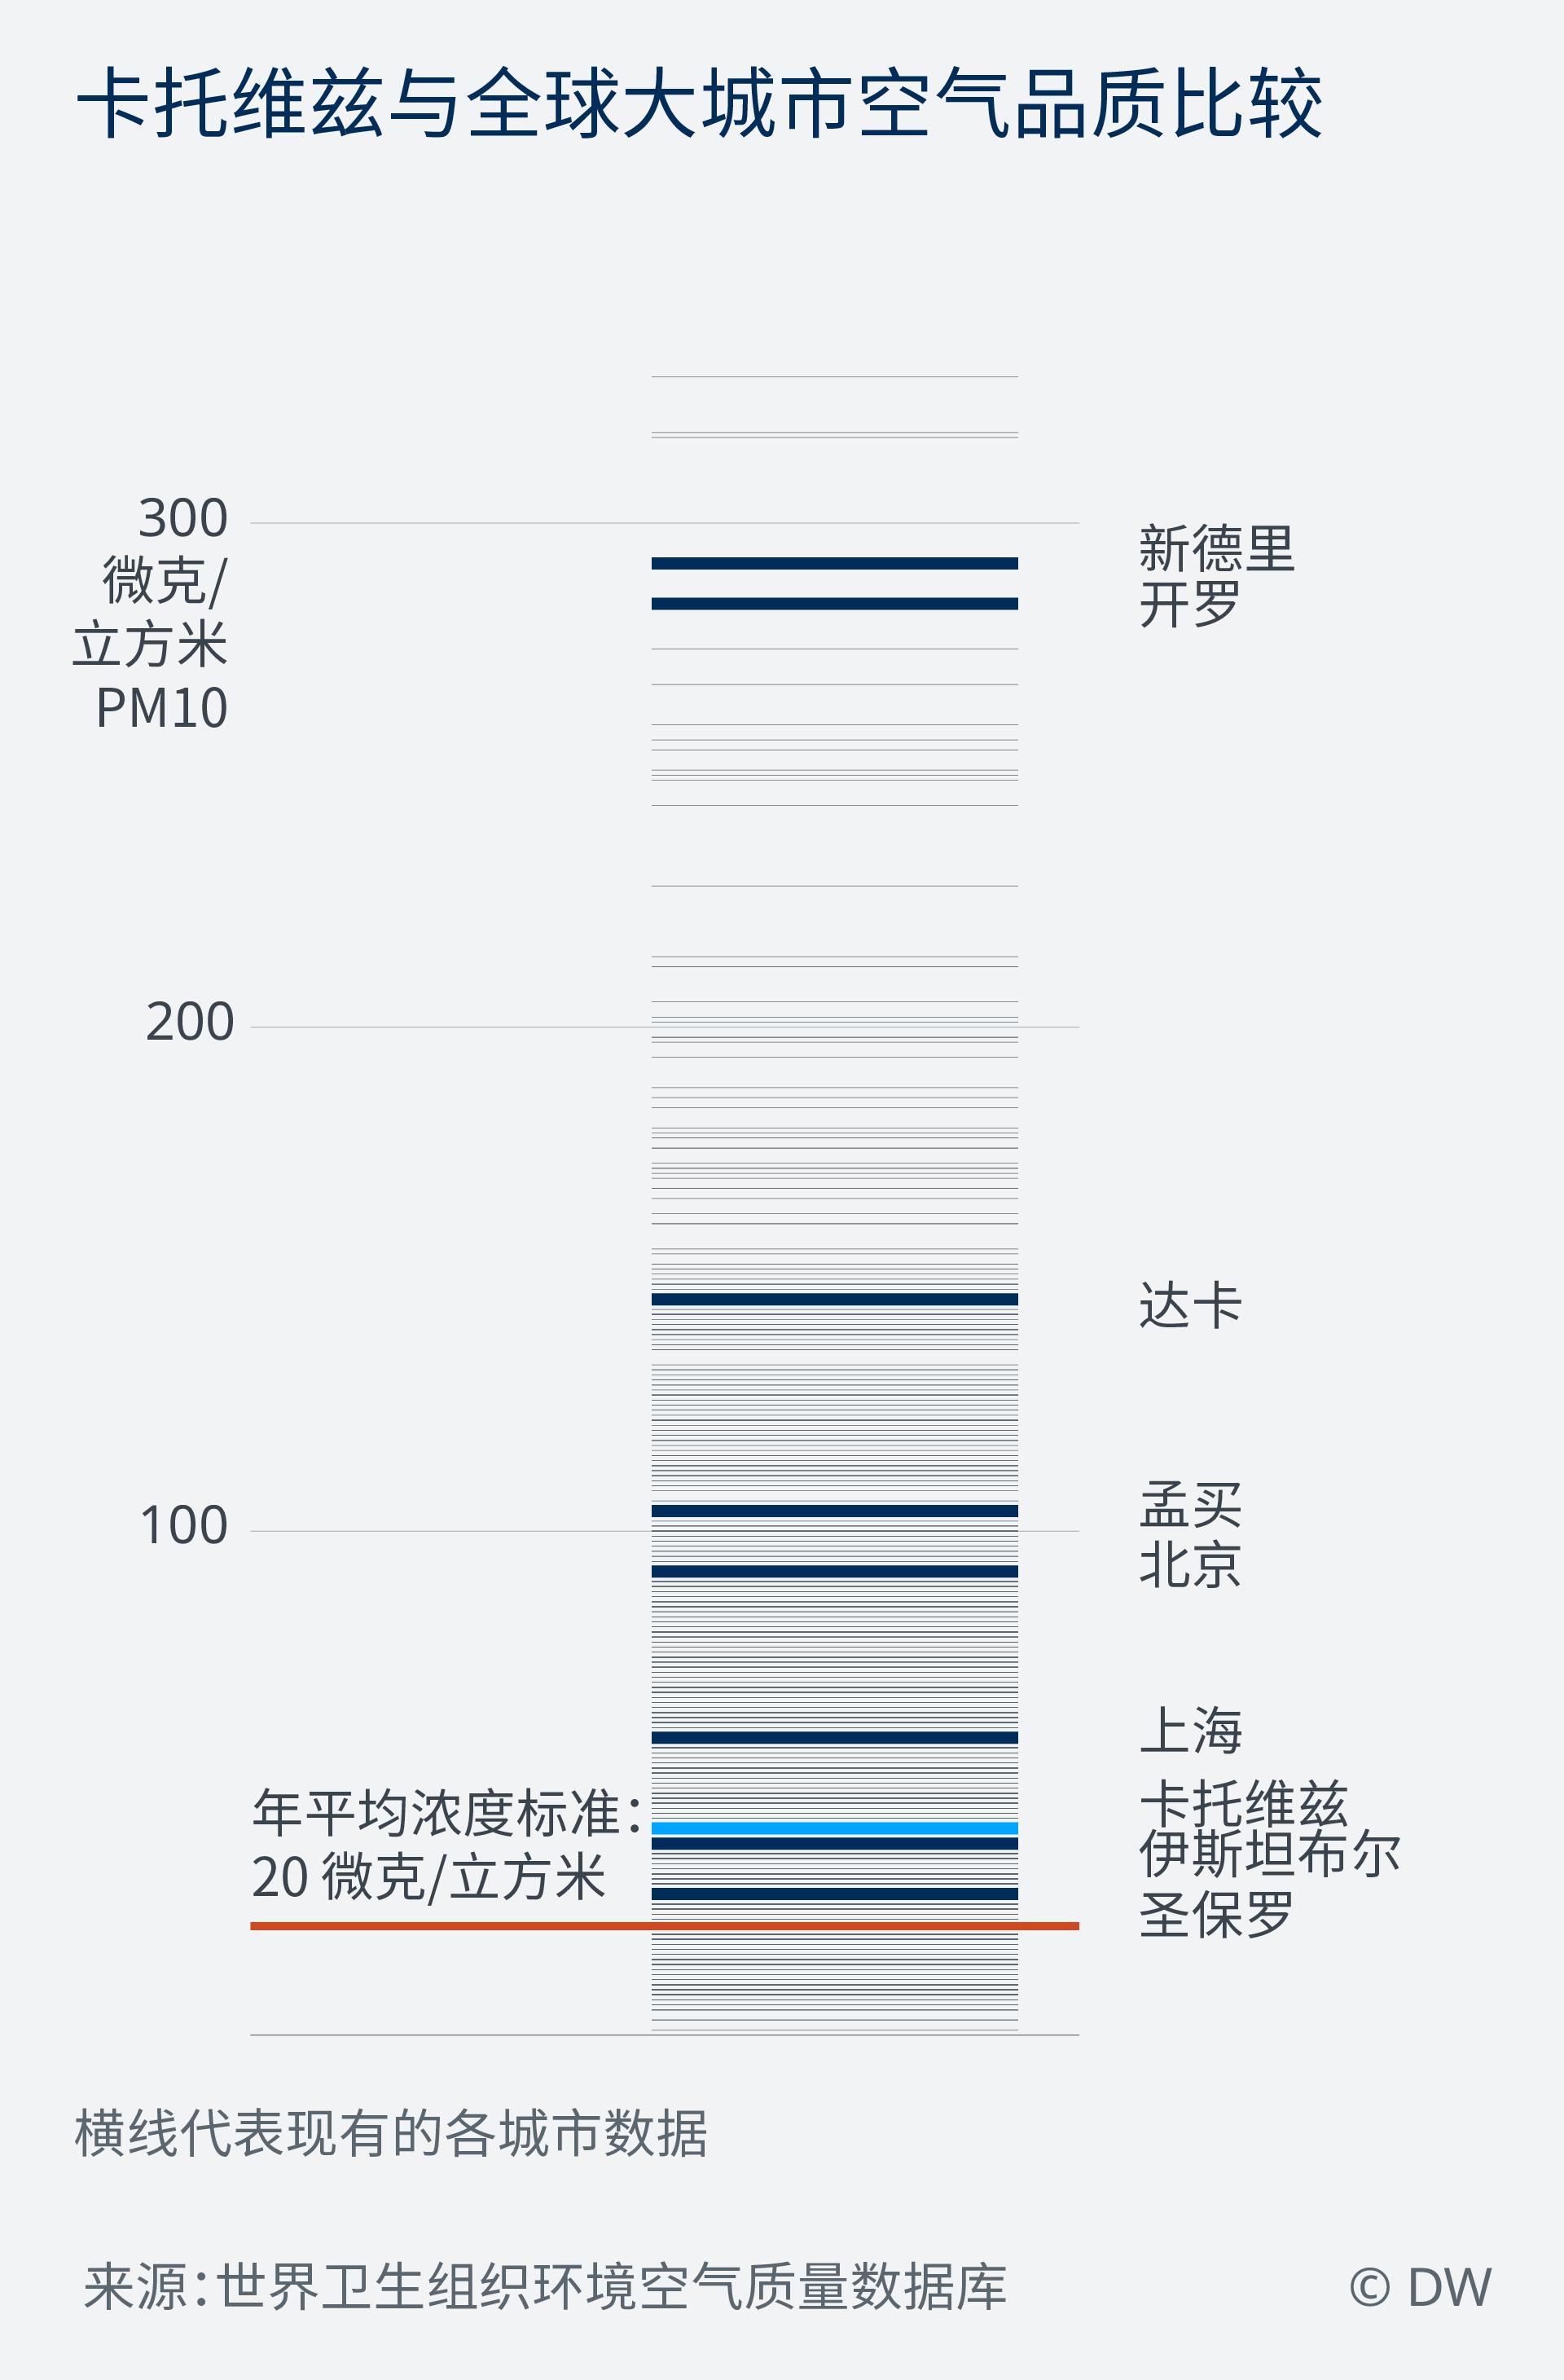 Data Visualization ZH COP24 air quality